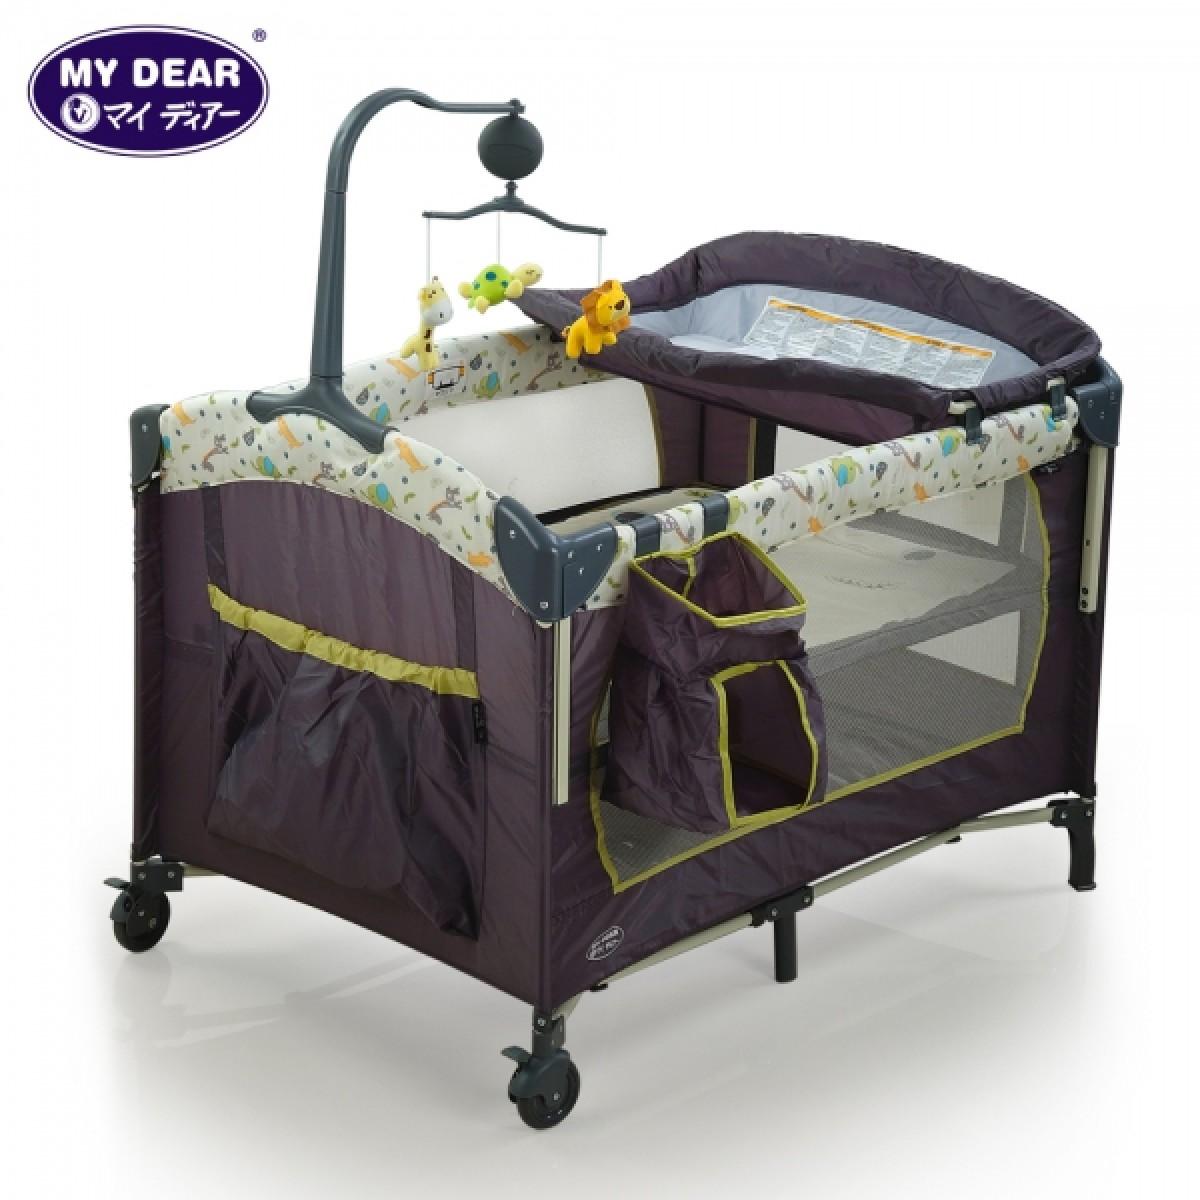 (SB7322B) Baby Bed - Kico Baby Center